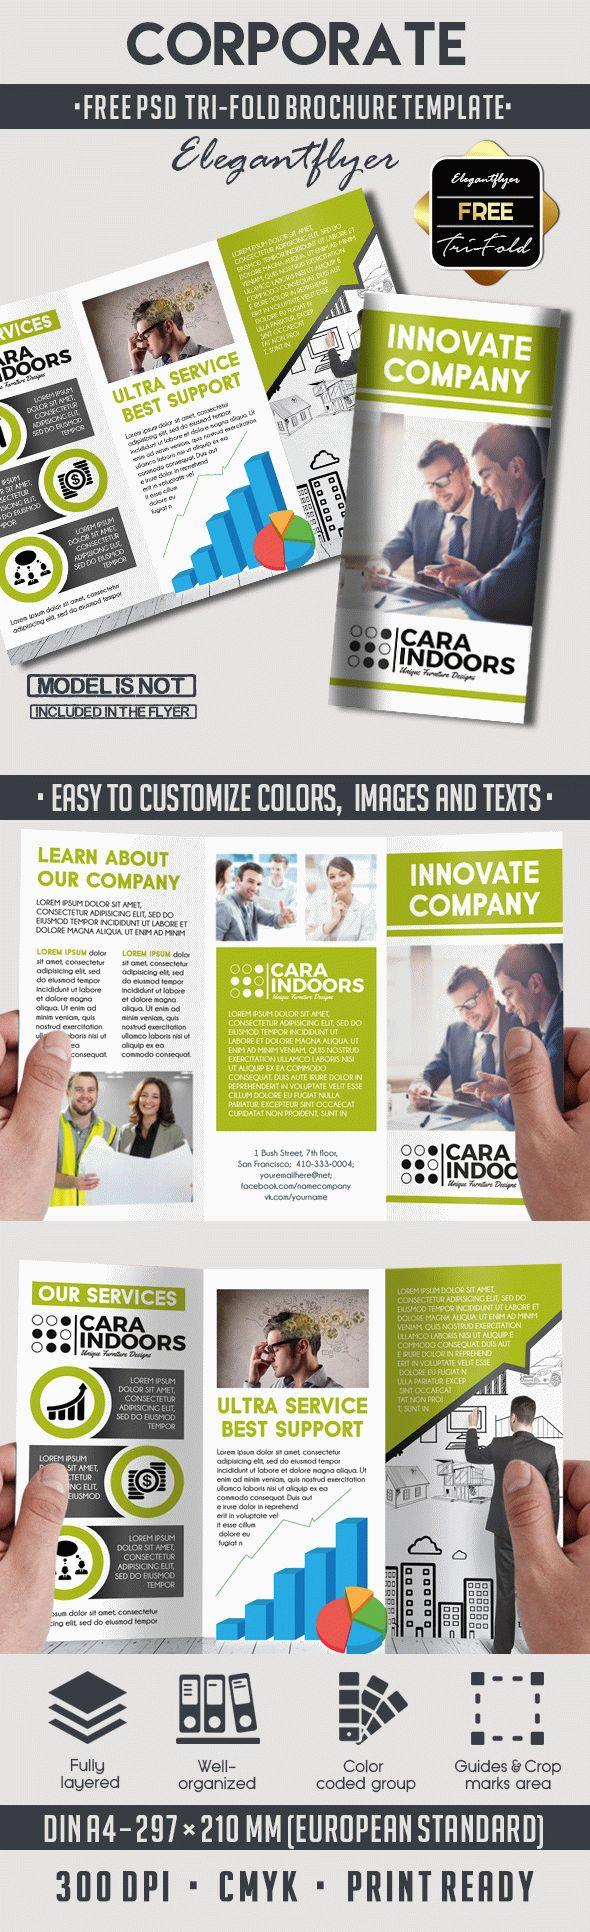 Corporate Free Psd Tri Fold Psd Brochure Template Pinterest